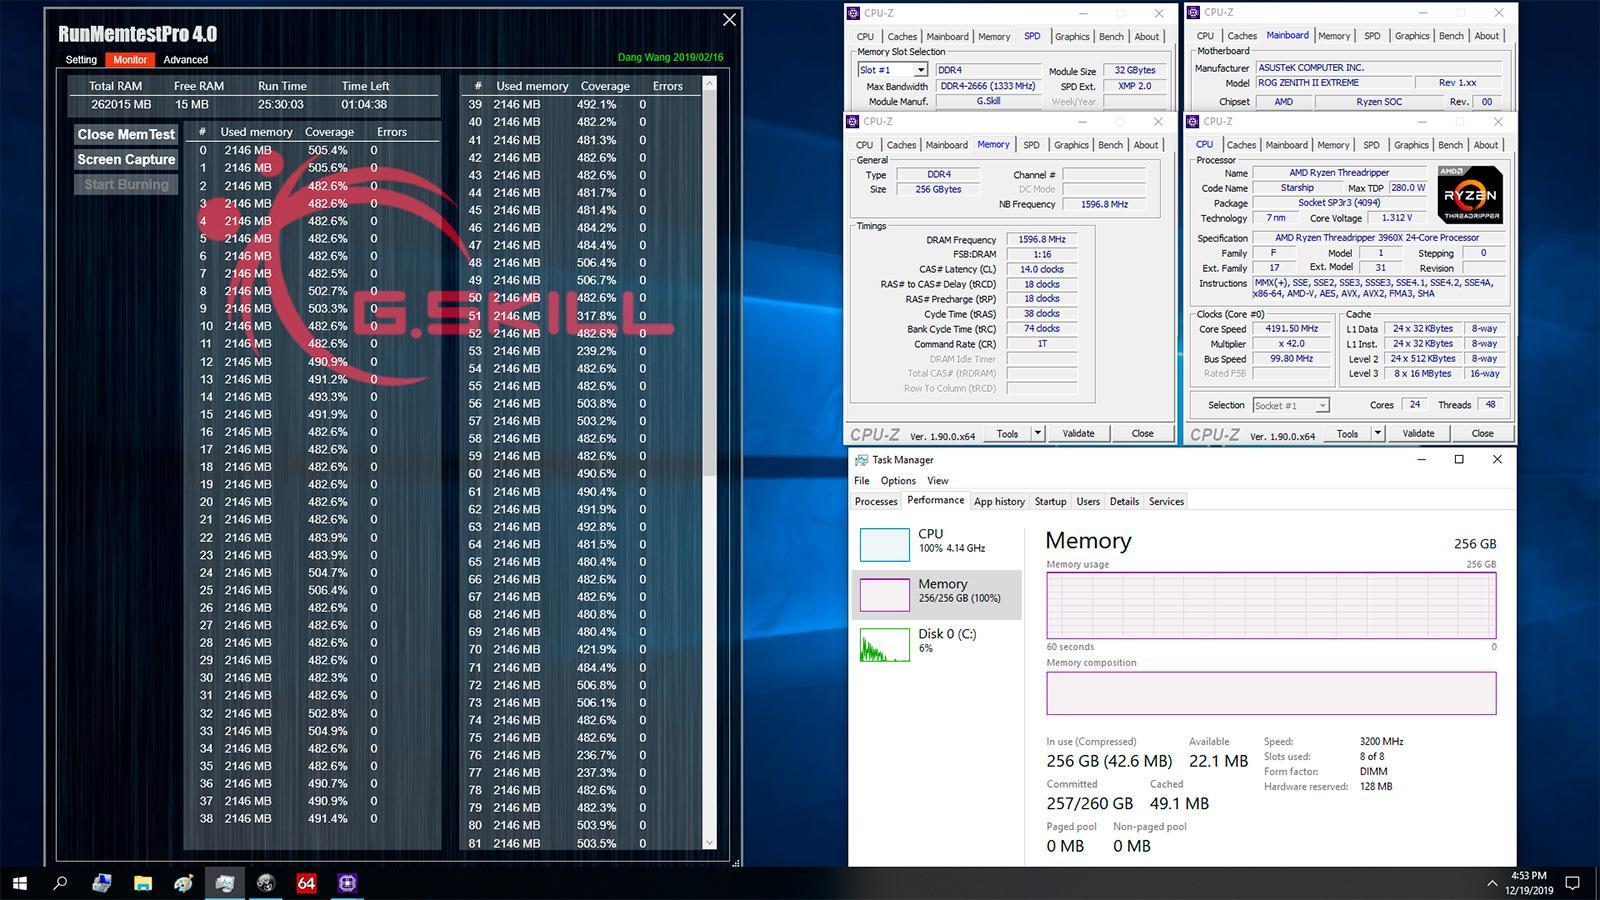 G.Skill анонсировала 32-ГБ модули памяти Trident Z DDR4-3200 с таймингами CL14